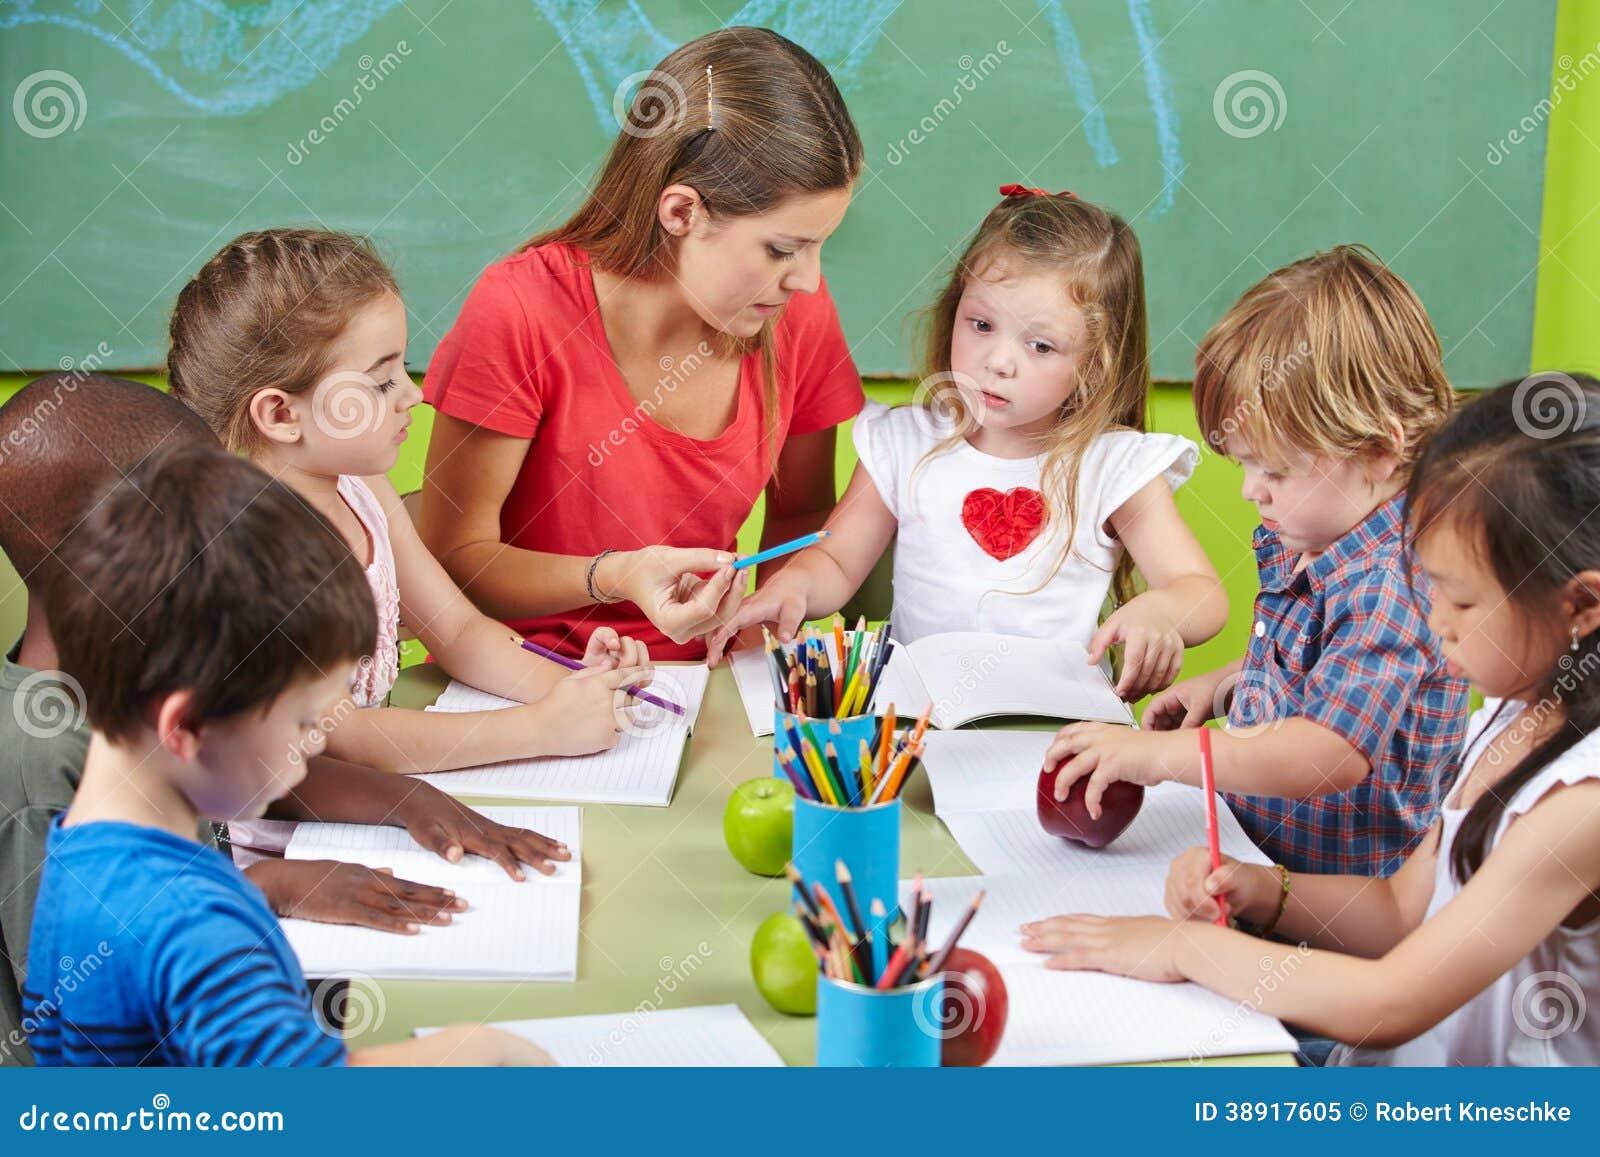 teaching photo essay to children